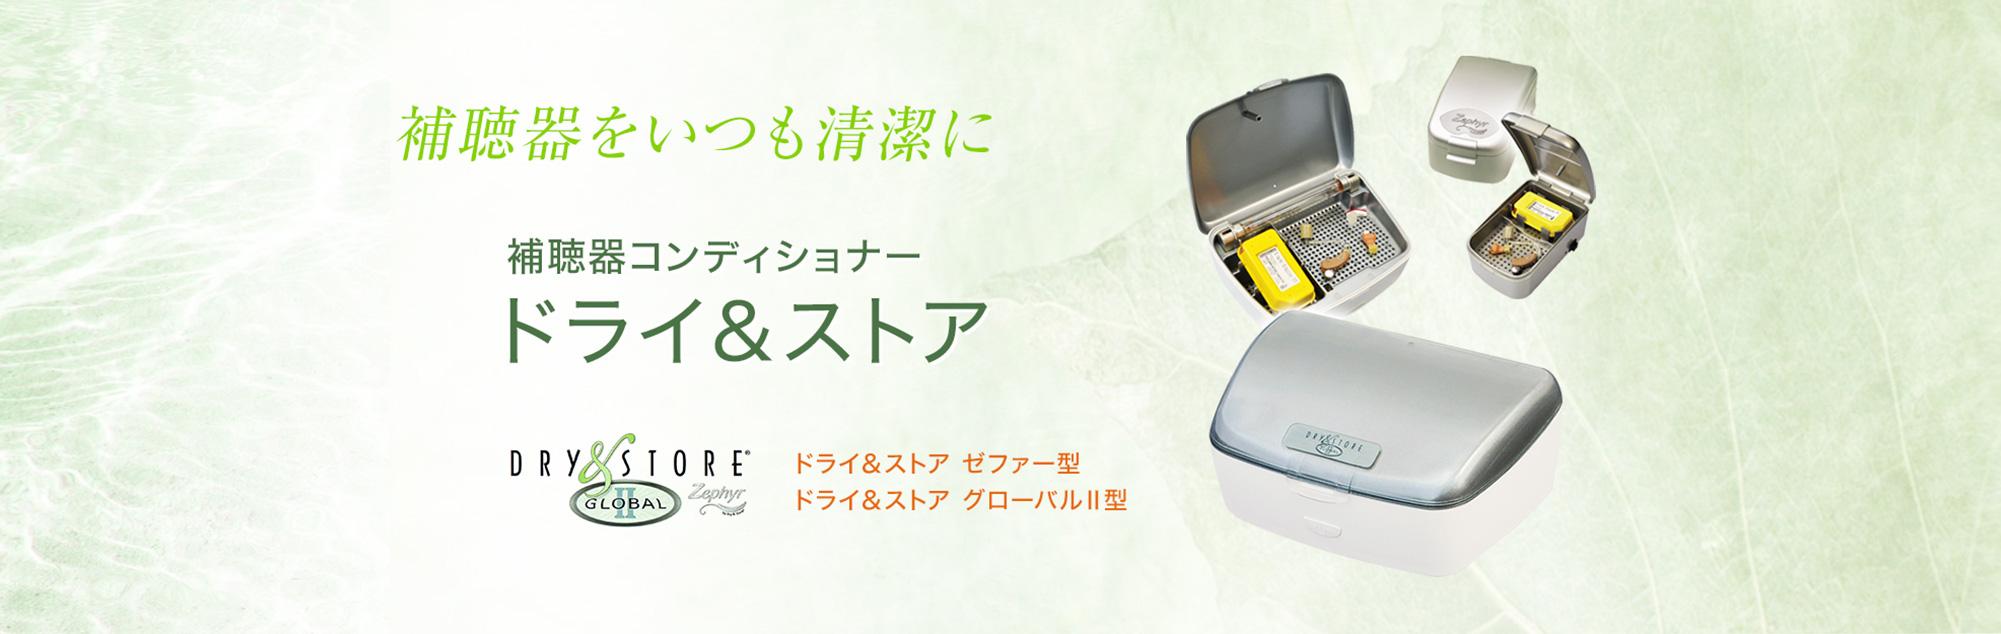 Pro 補聴器 Airpods